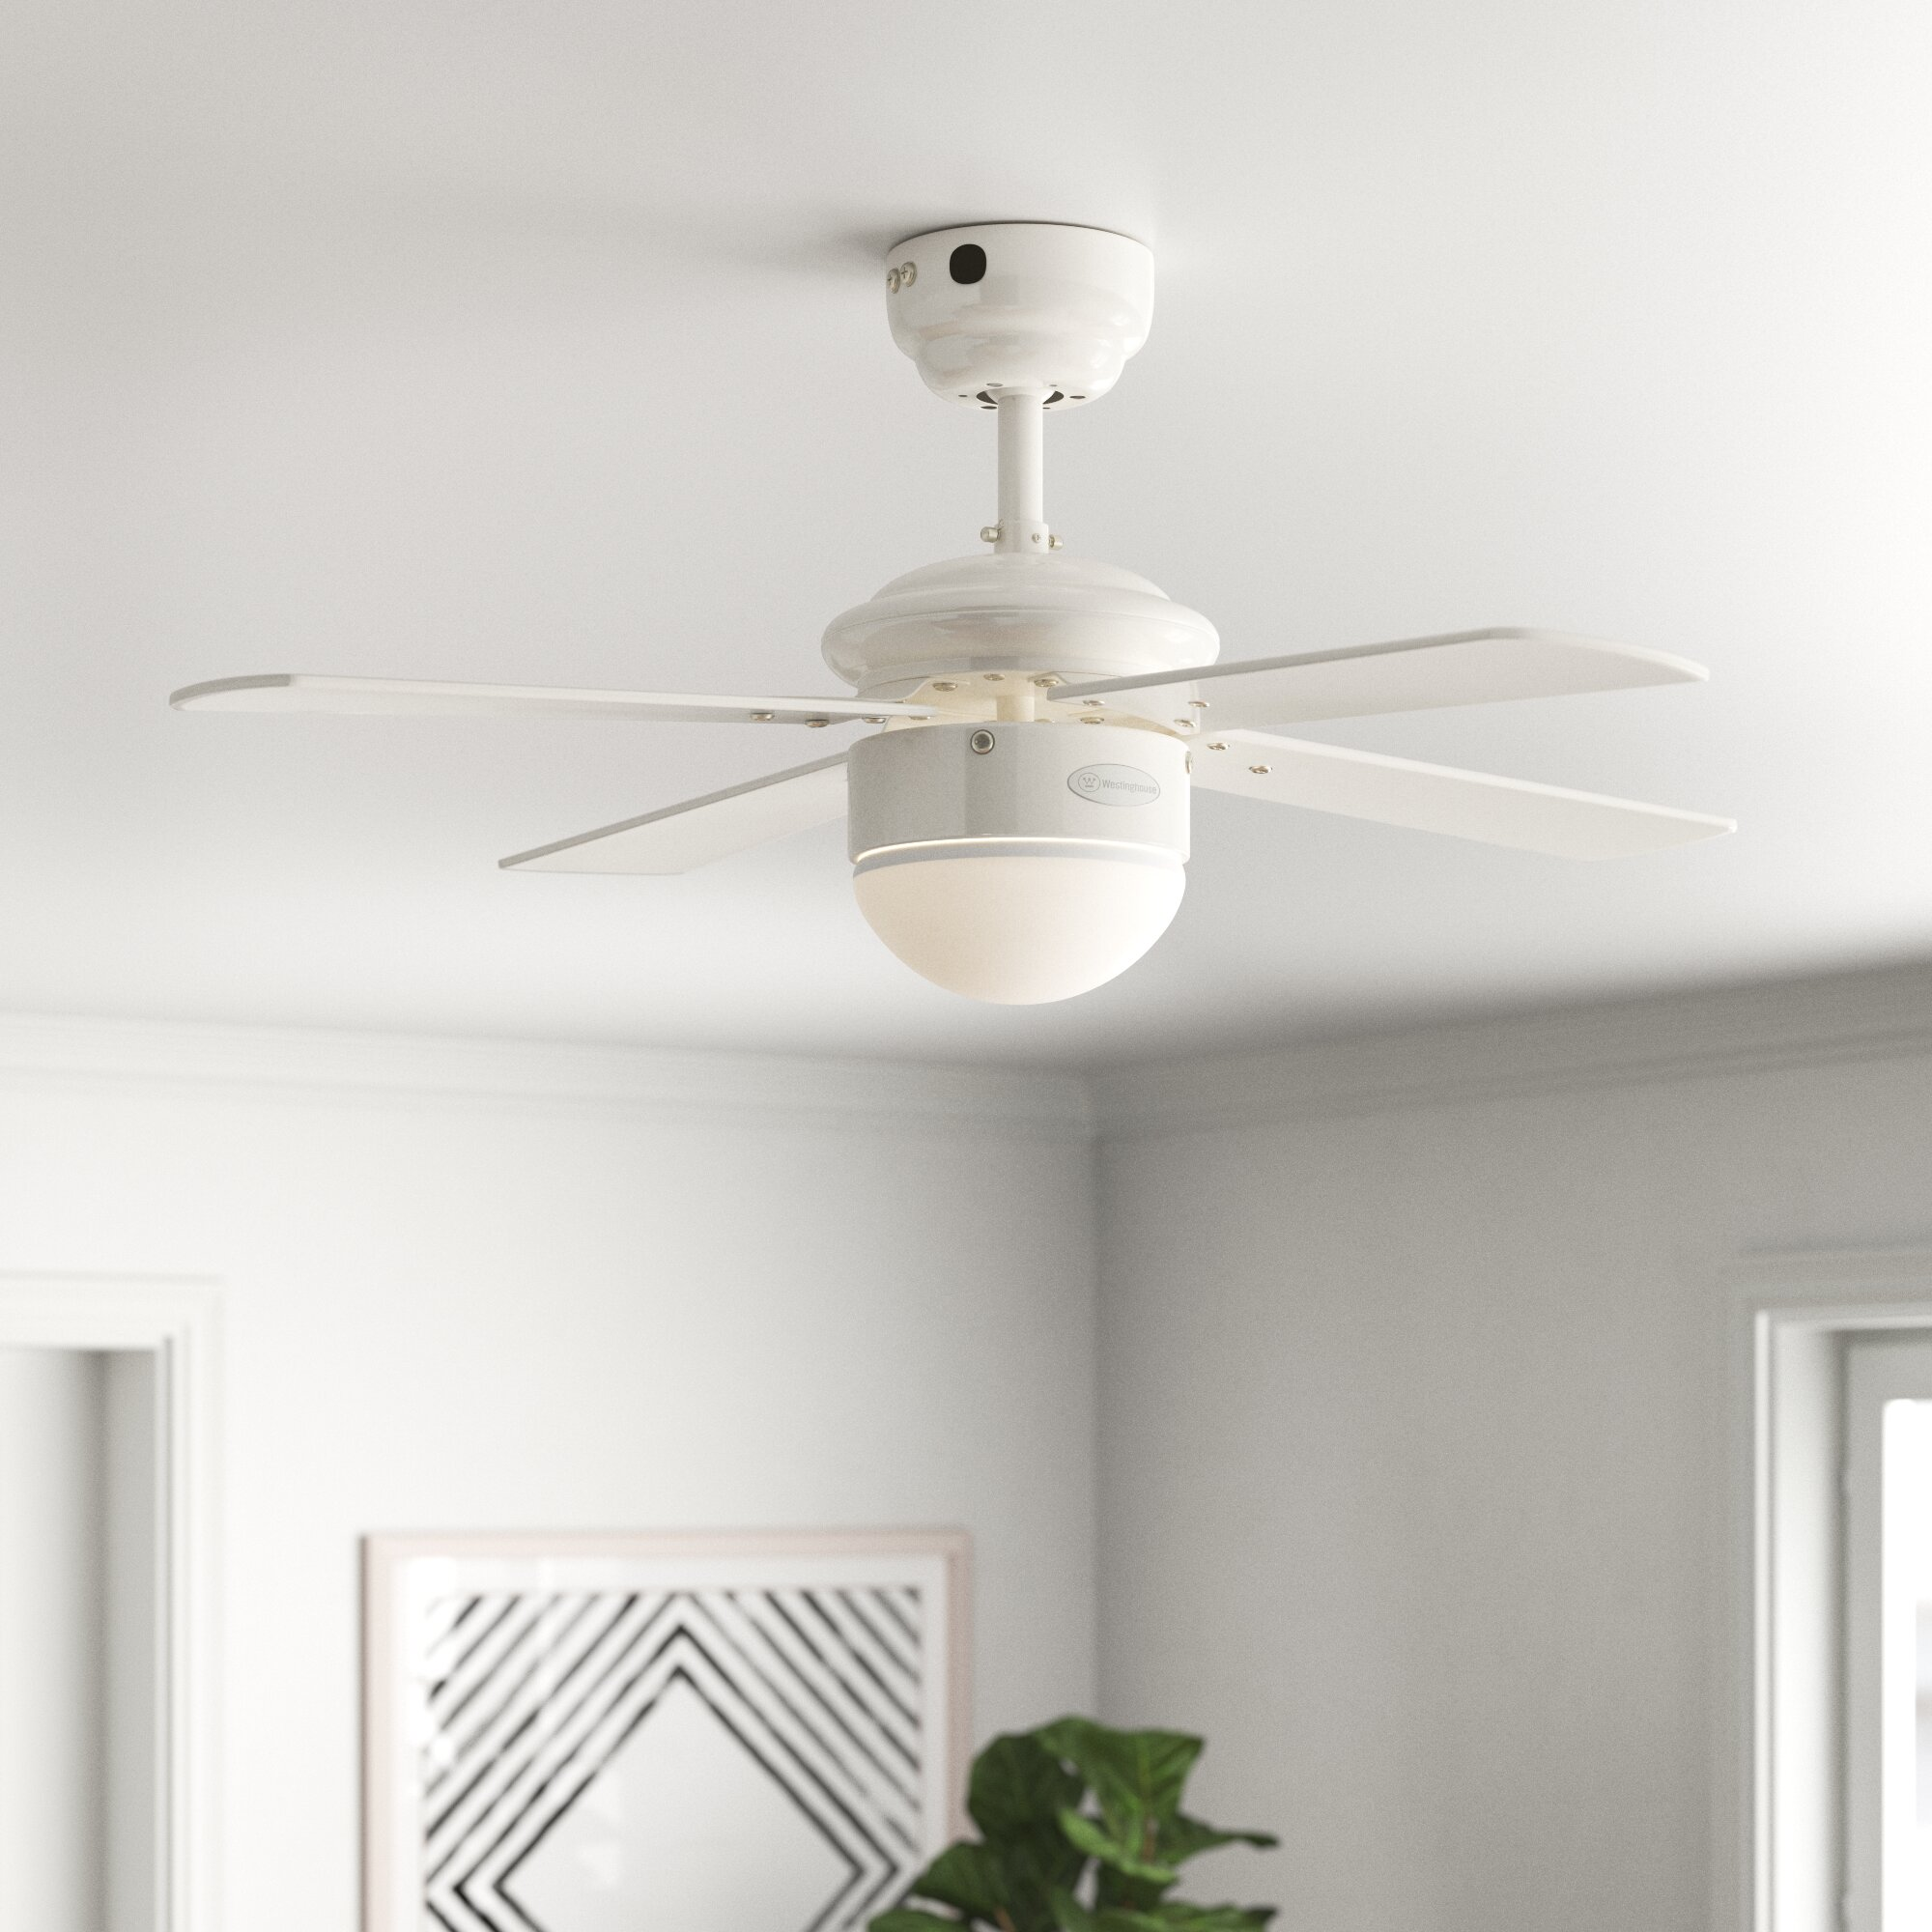 Zipcode Design Wirrian 90cm 4 Blade Ceiling Fan With Remote Reviews Wayfair Co Uk